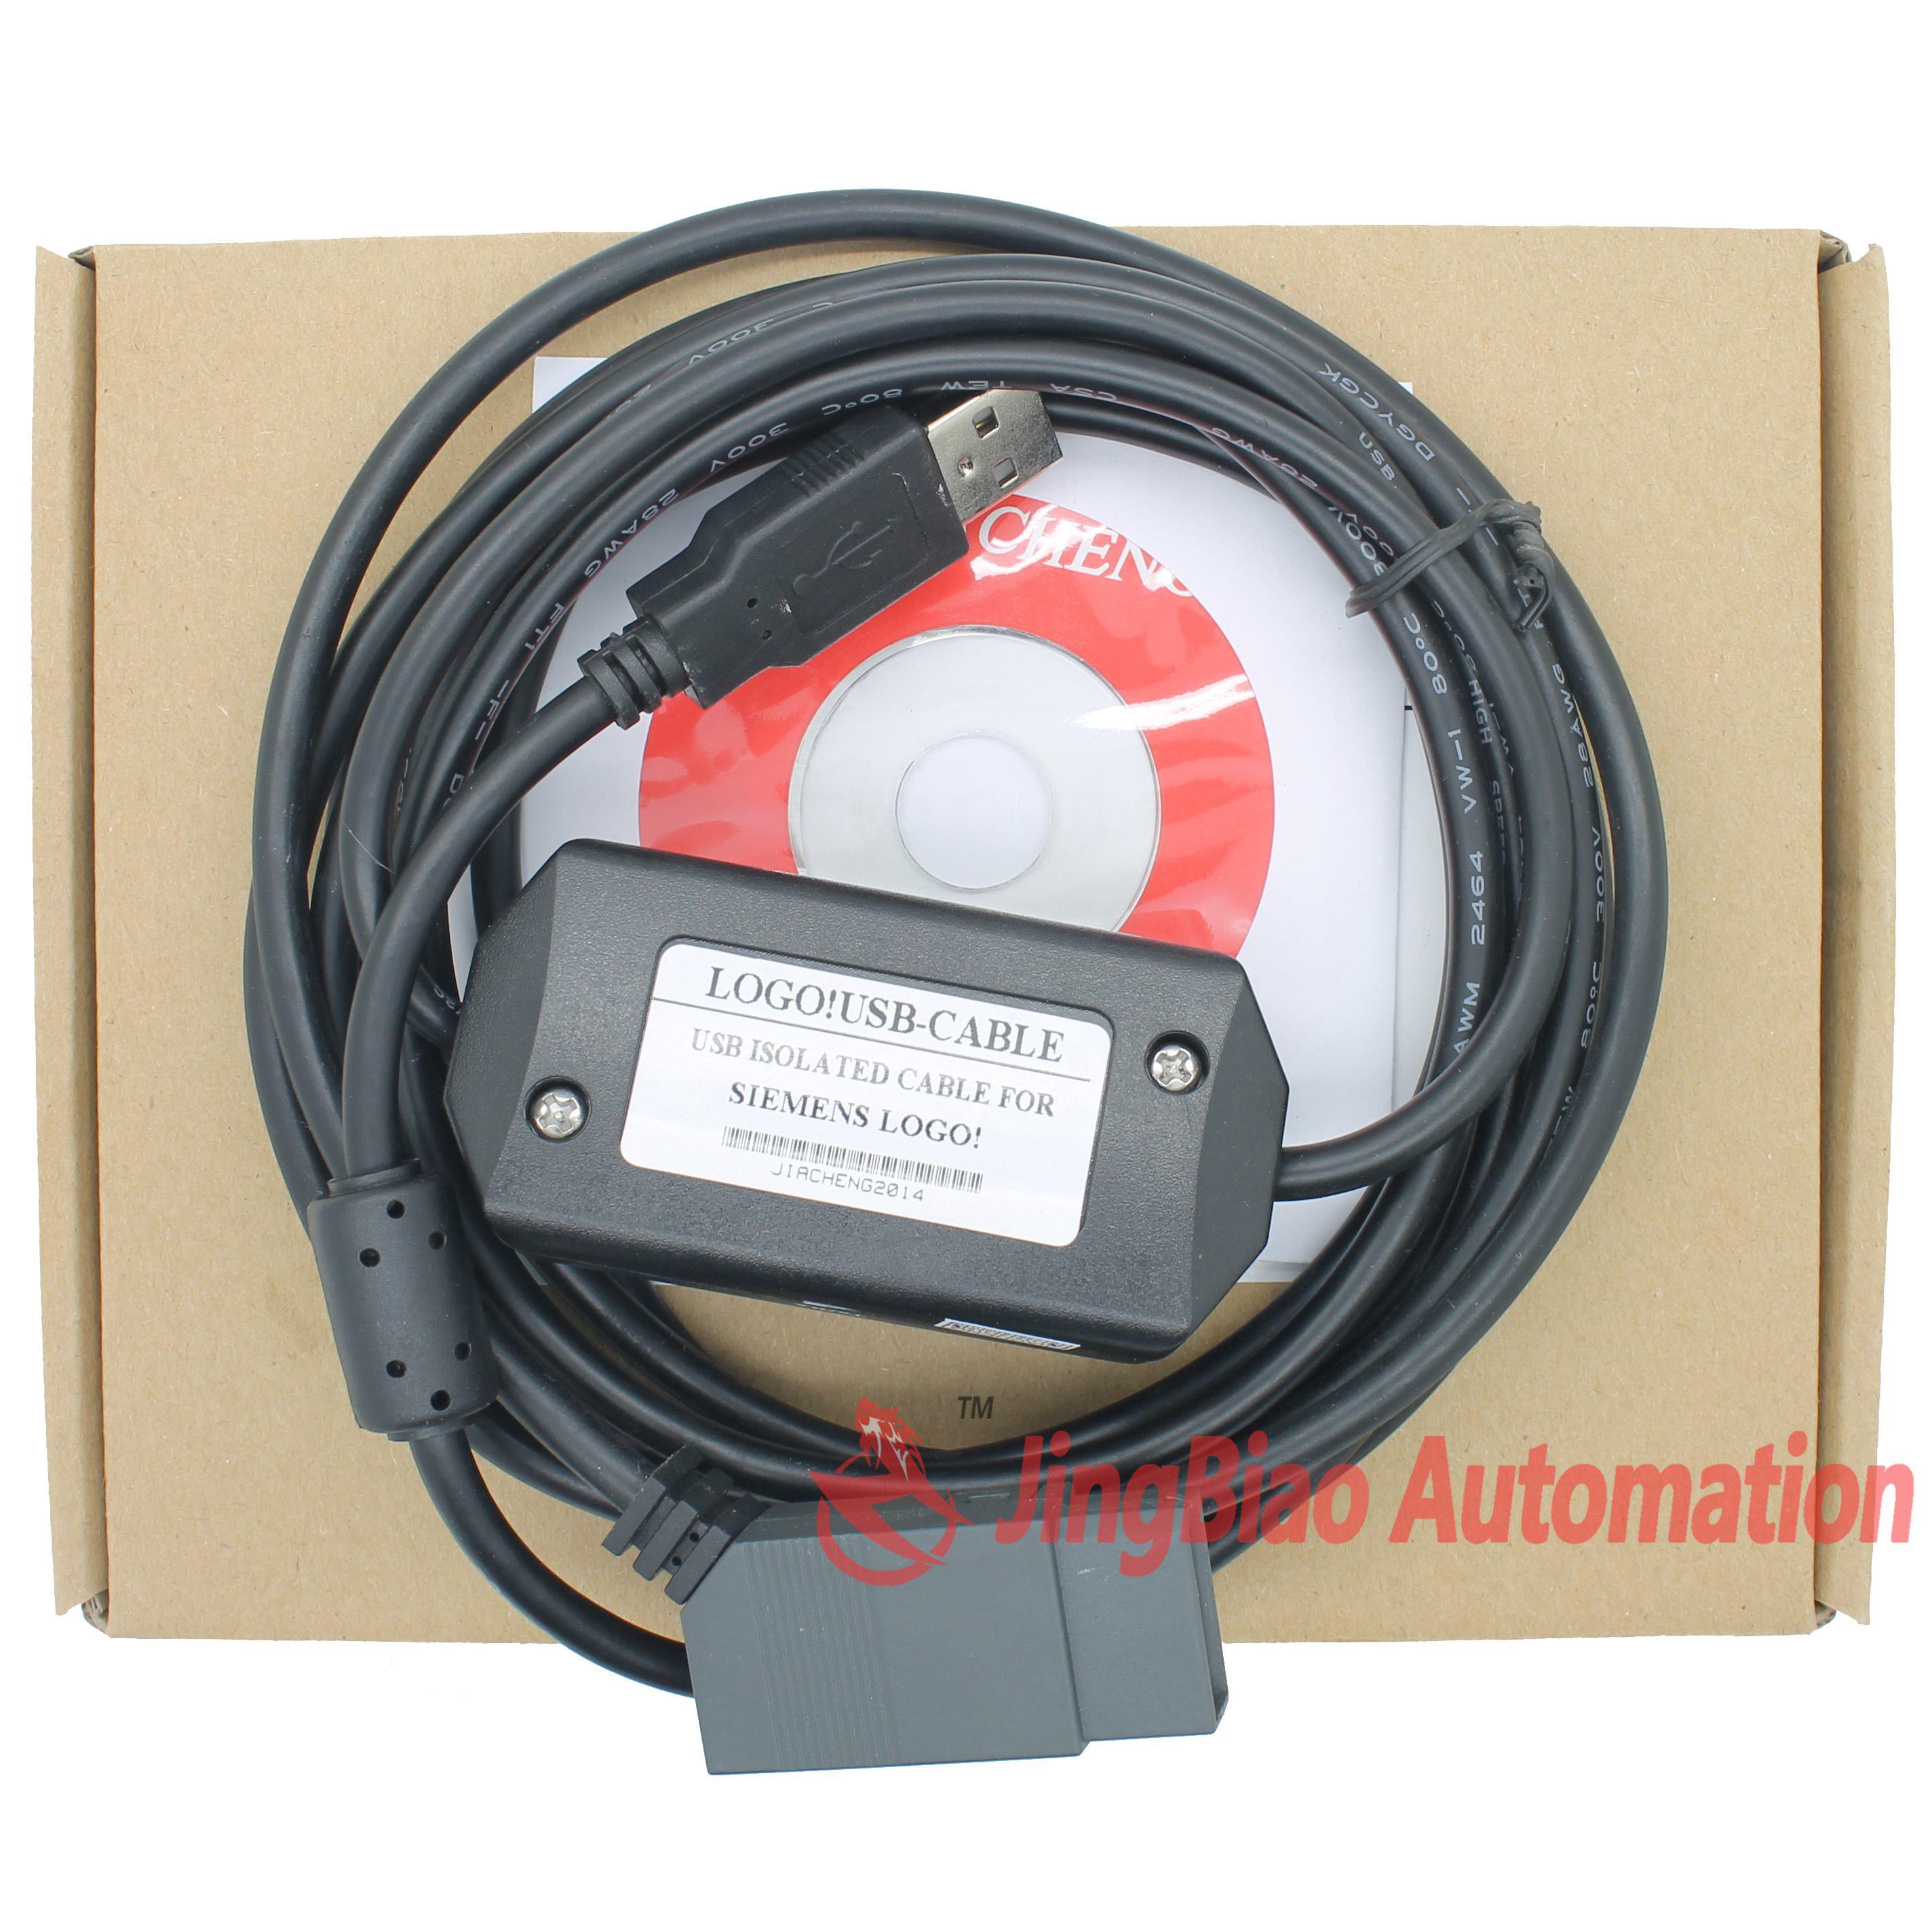 USB-LOGO Programming Cable for Siemens LOGO! USB Version PLC